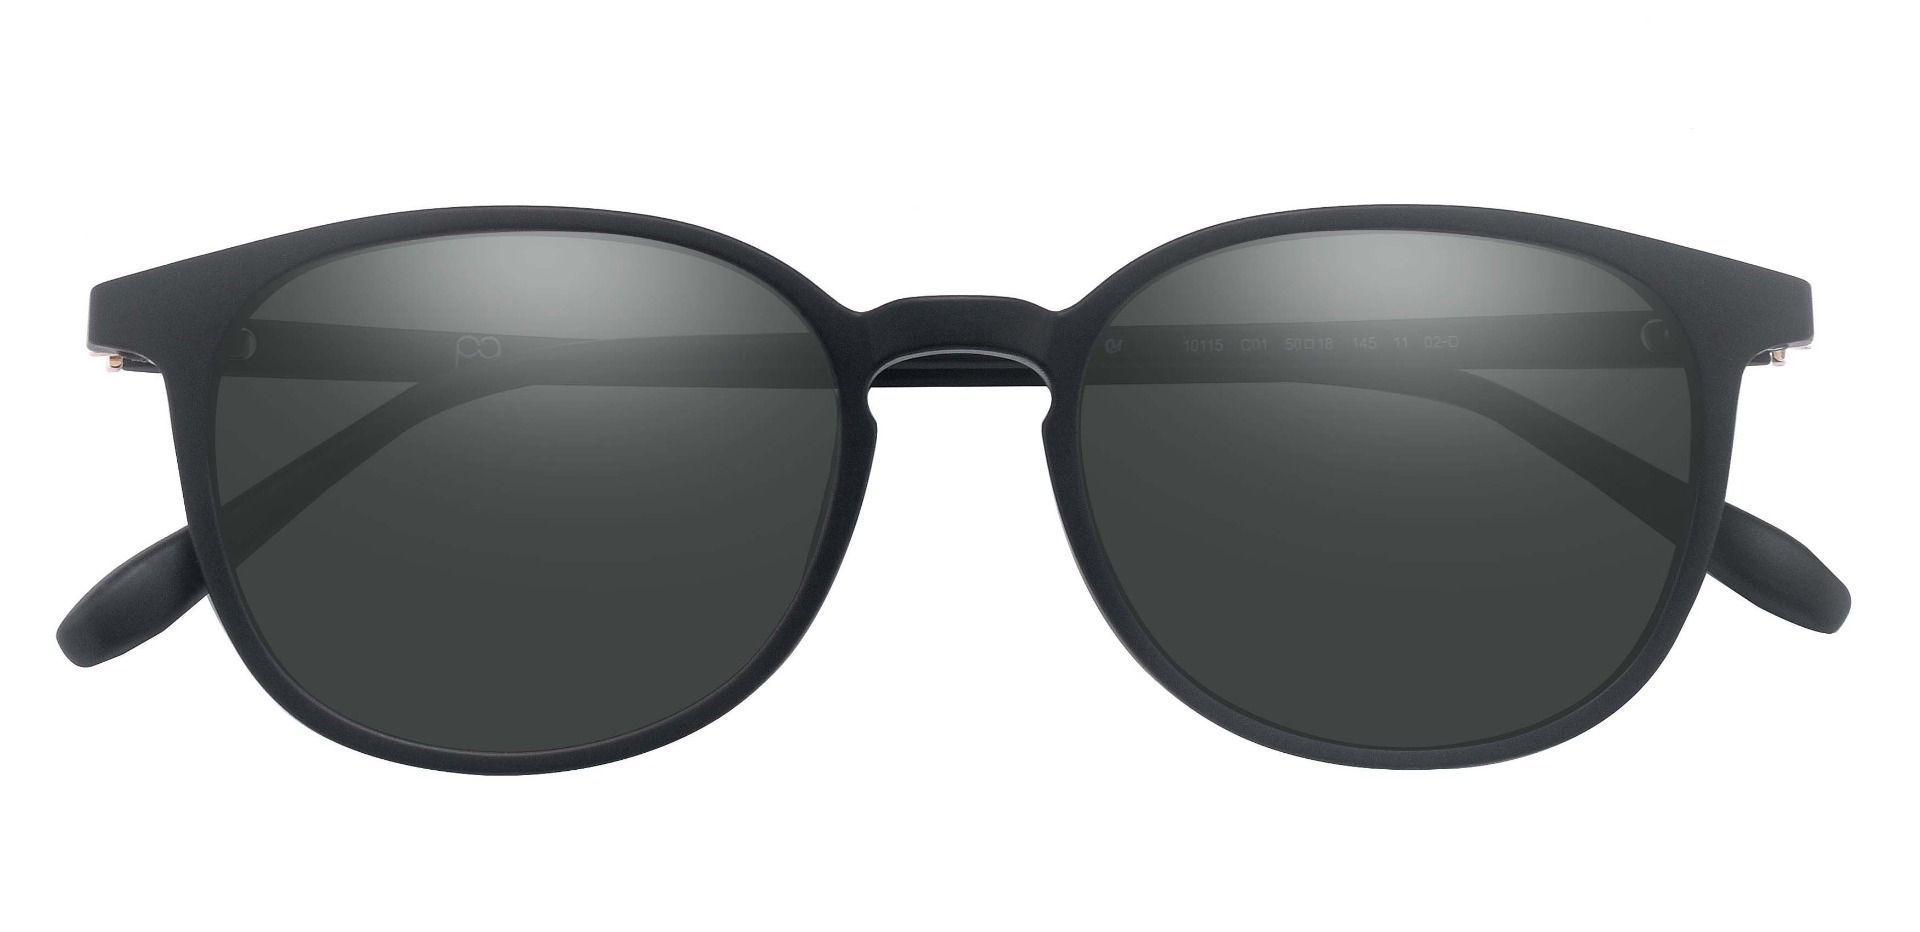 Lexington Oval Prescription Sunglasses - Black Frame With Gray Lenses